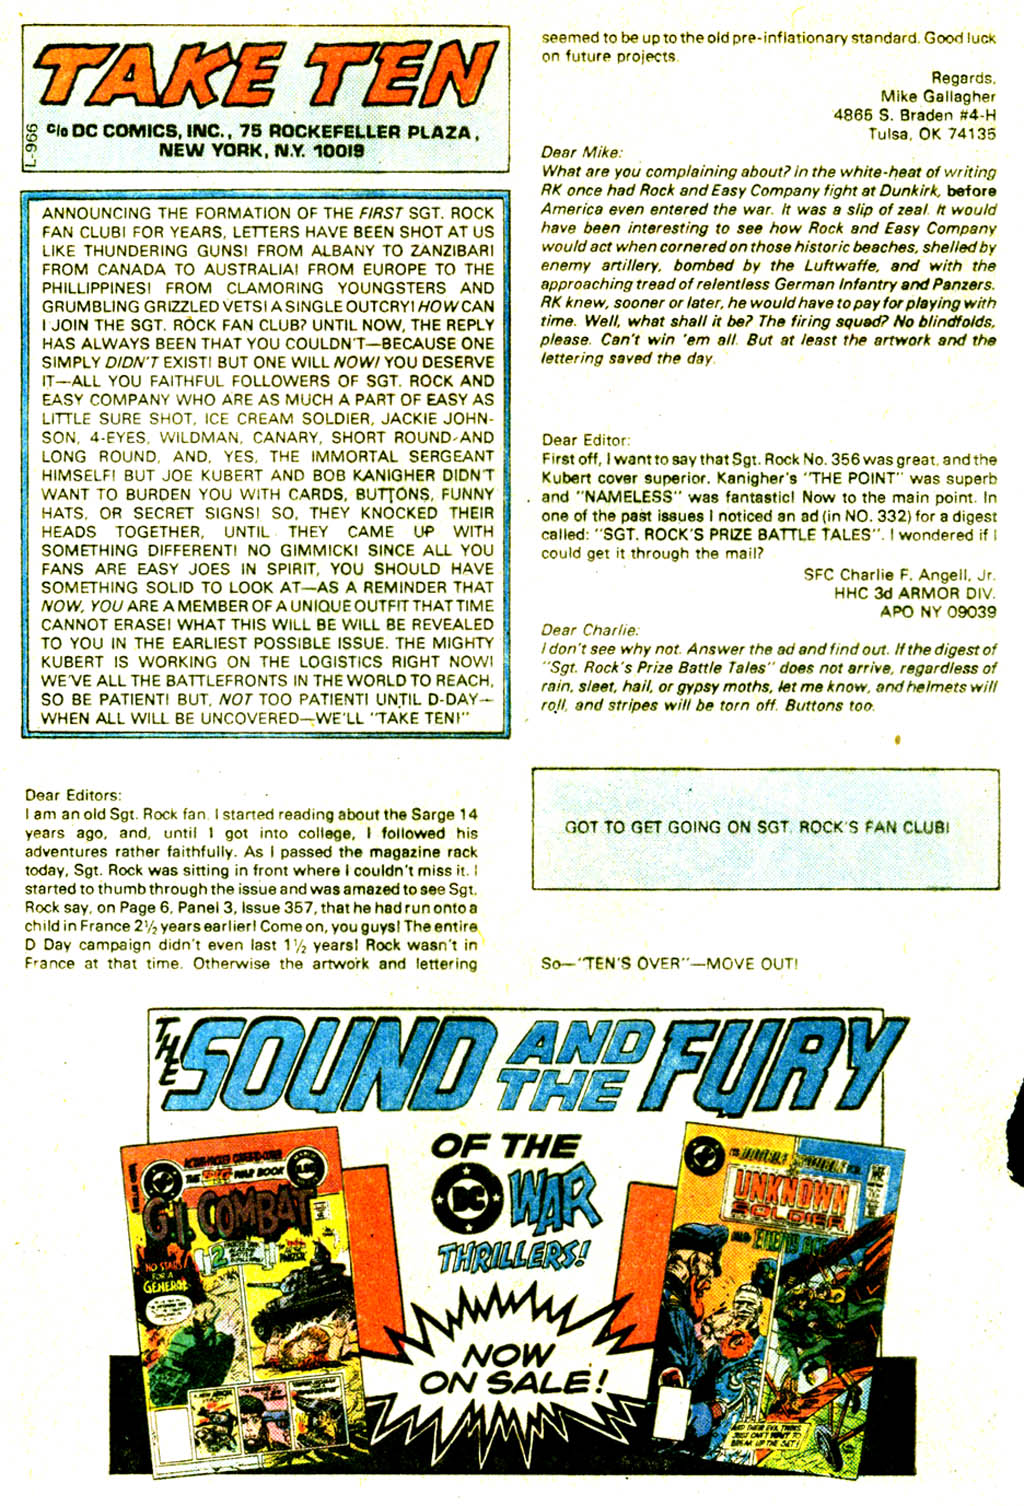 Read online Sgt. Rock comic -  Issue #362 - 32